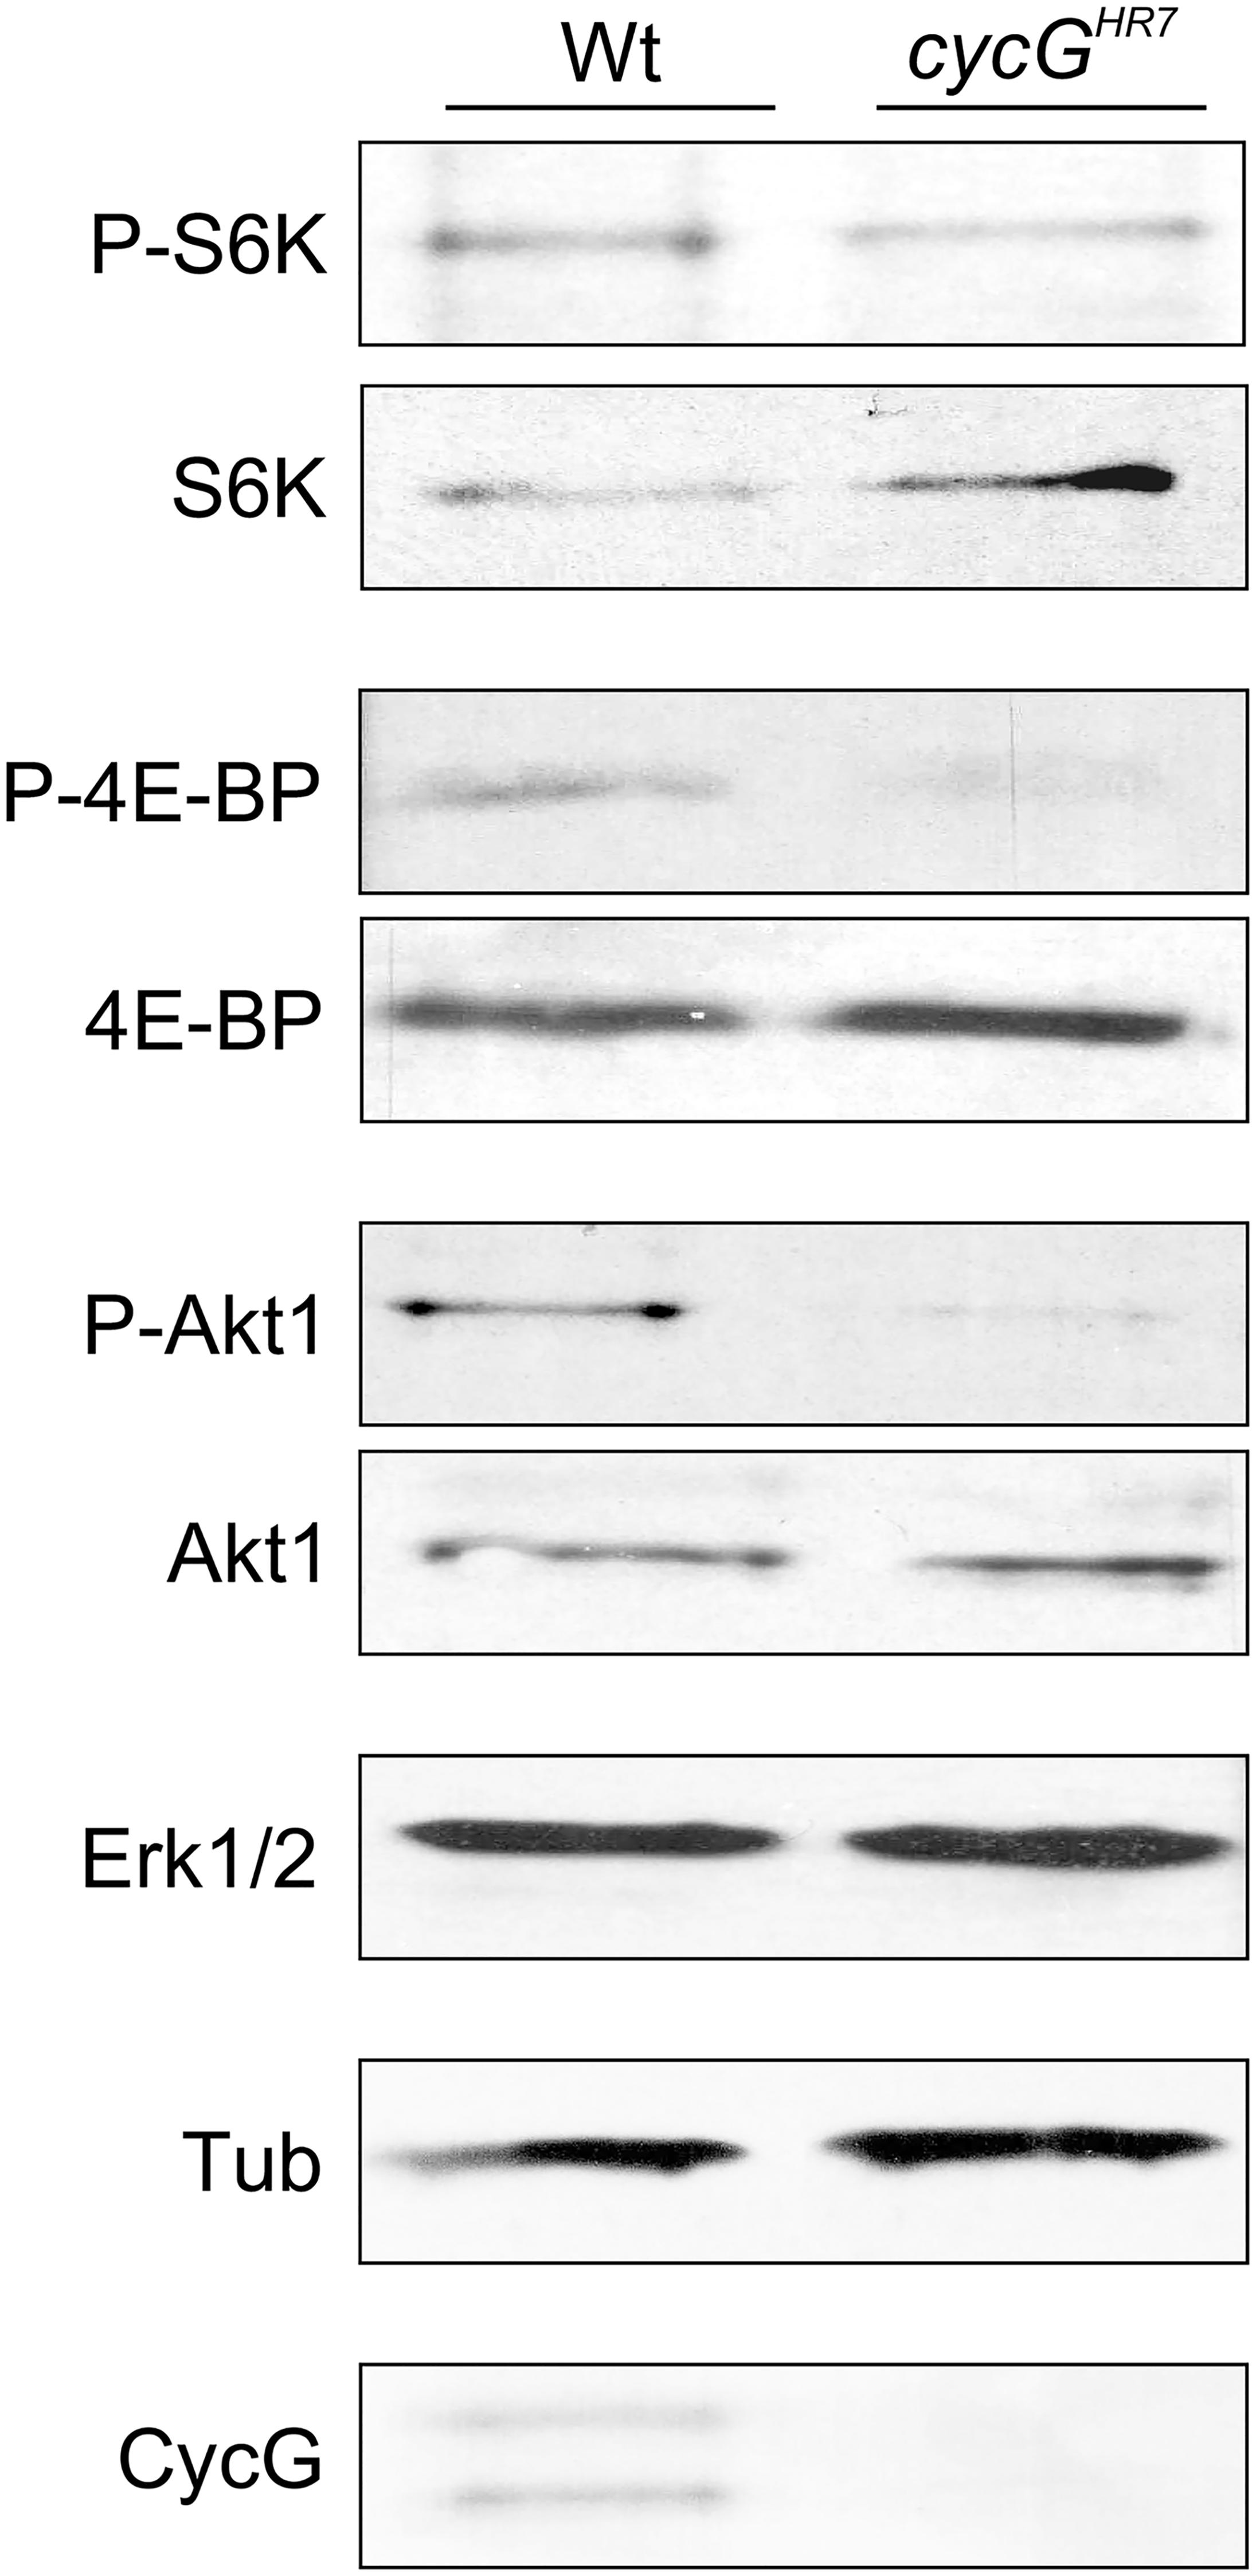 Reduced phosphorylation levels of InR/TOR targets in <i>cycG</i><sup><i>HR7</i></sup> mutants.